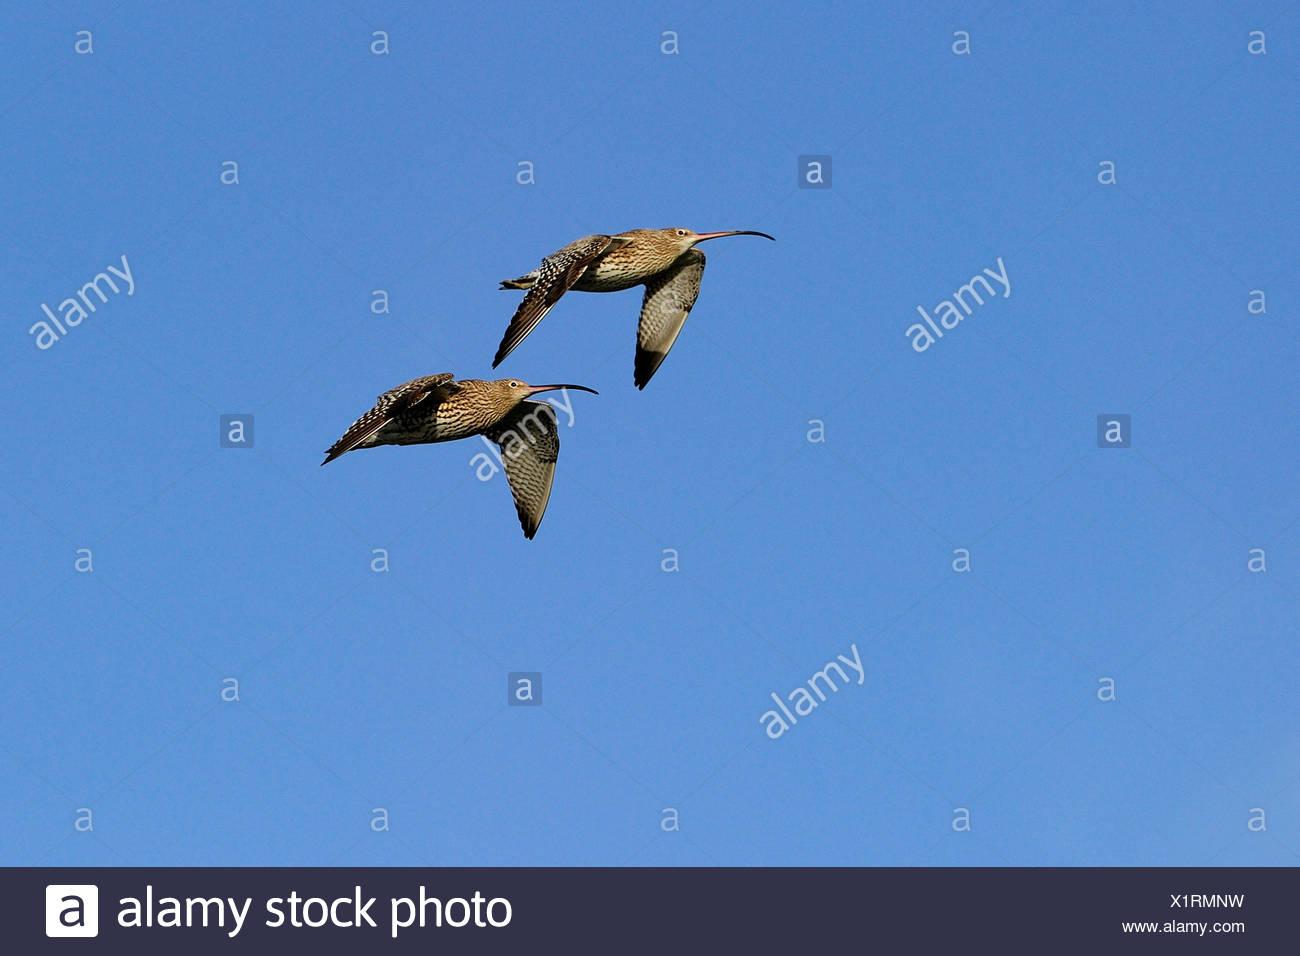 western curlew (Numenius arquata), two birds flying, Germany, North Rhine-Westphalia Stock Photo